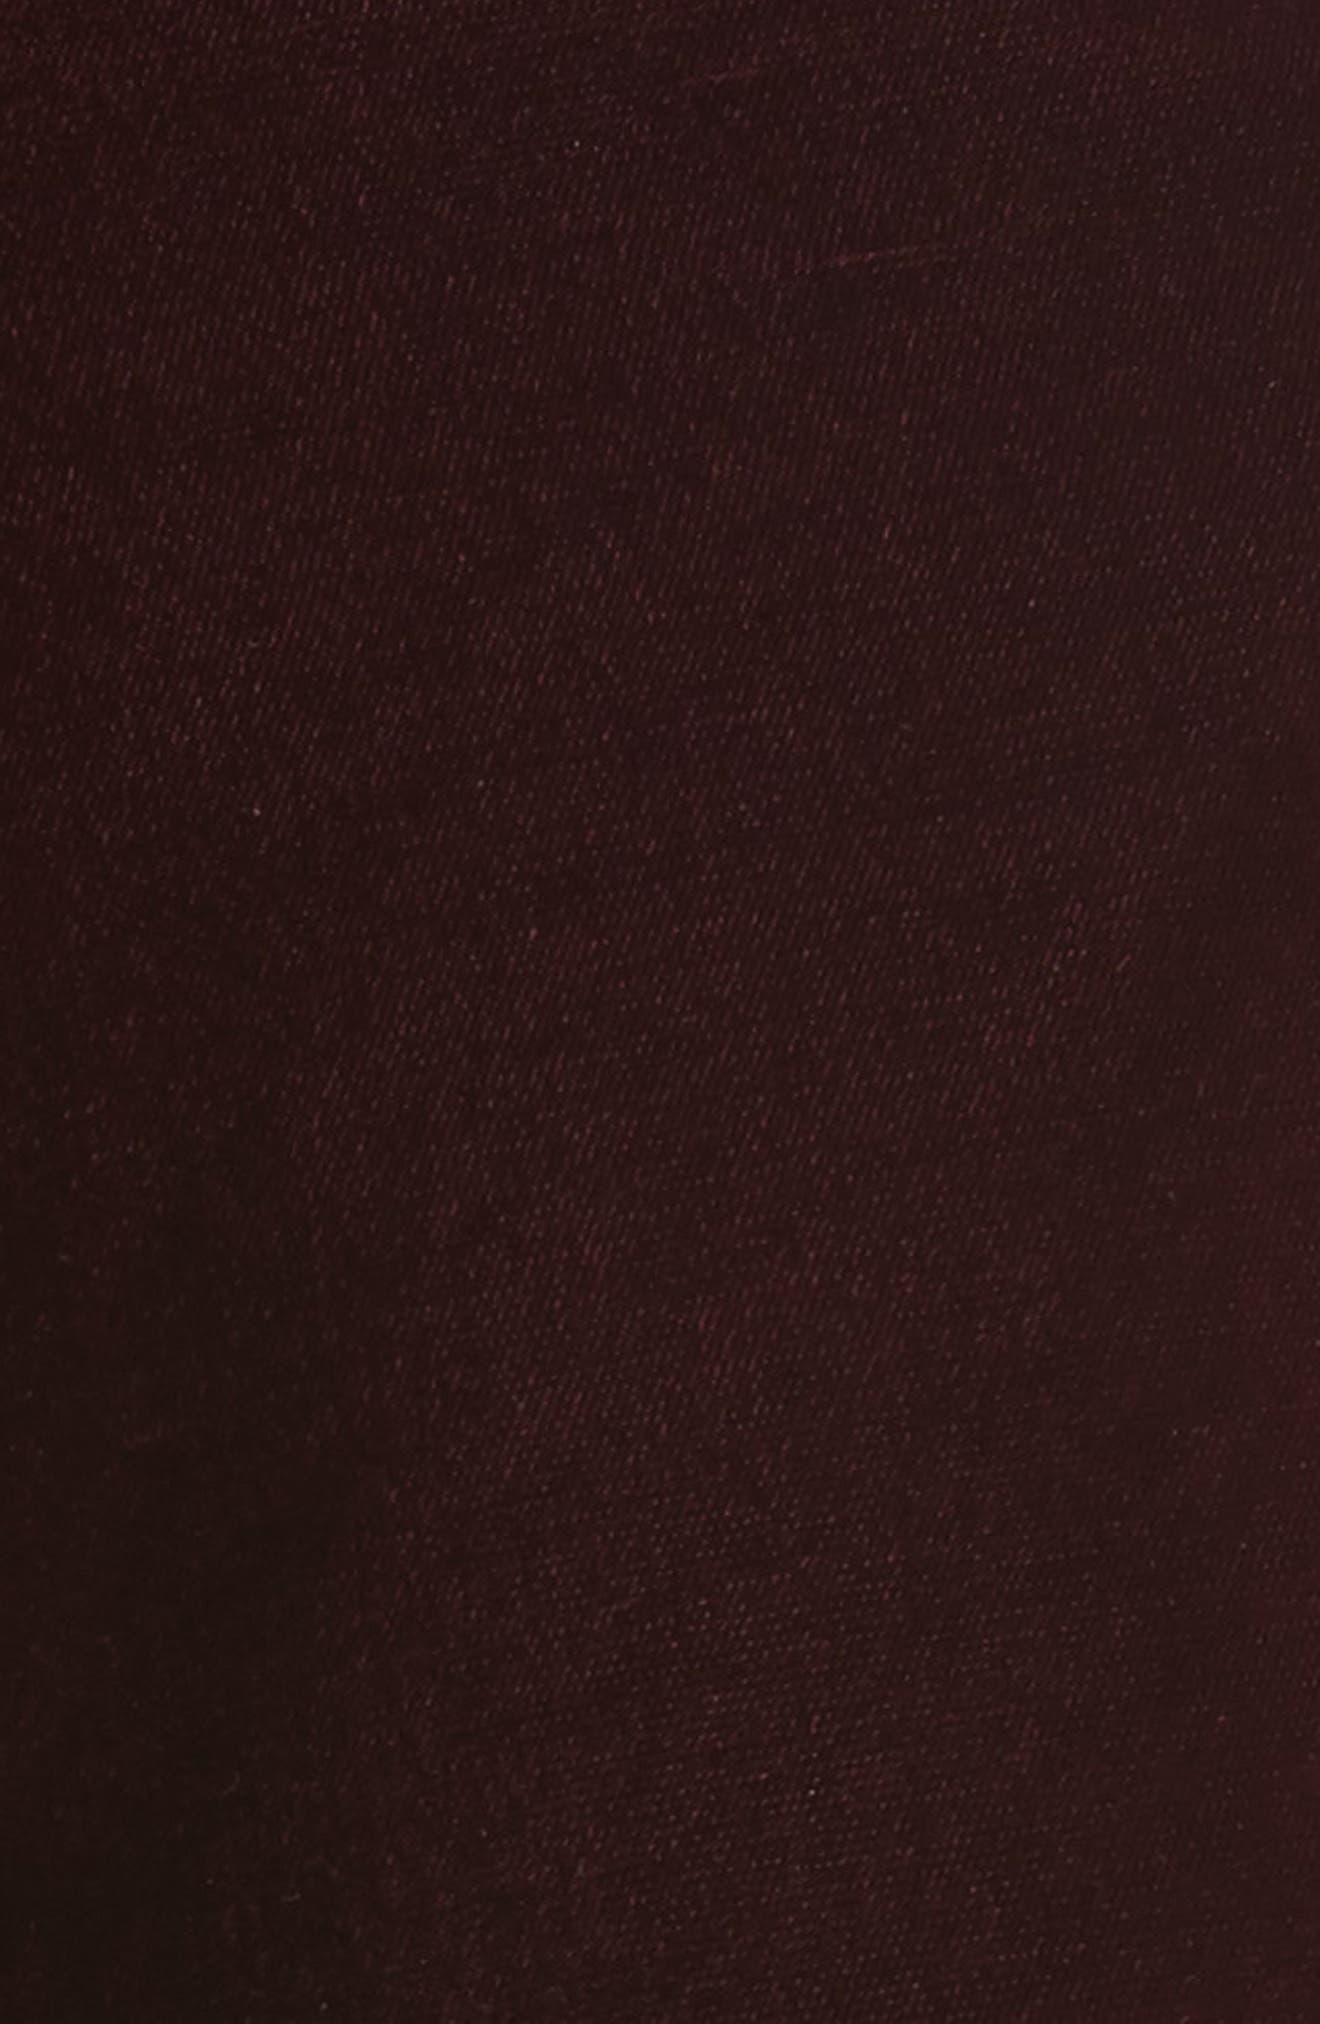 Bonded Velvet Crop Pants,                             Alternate thumbnail 5, color,                             930